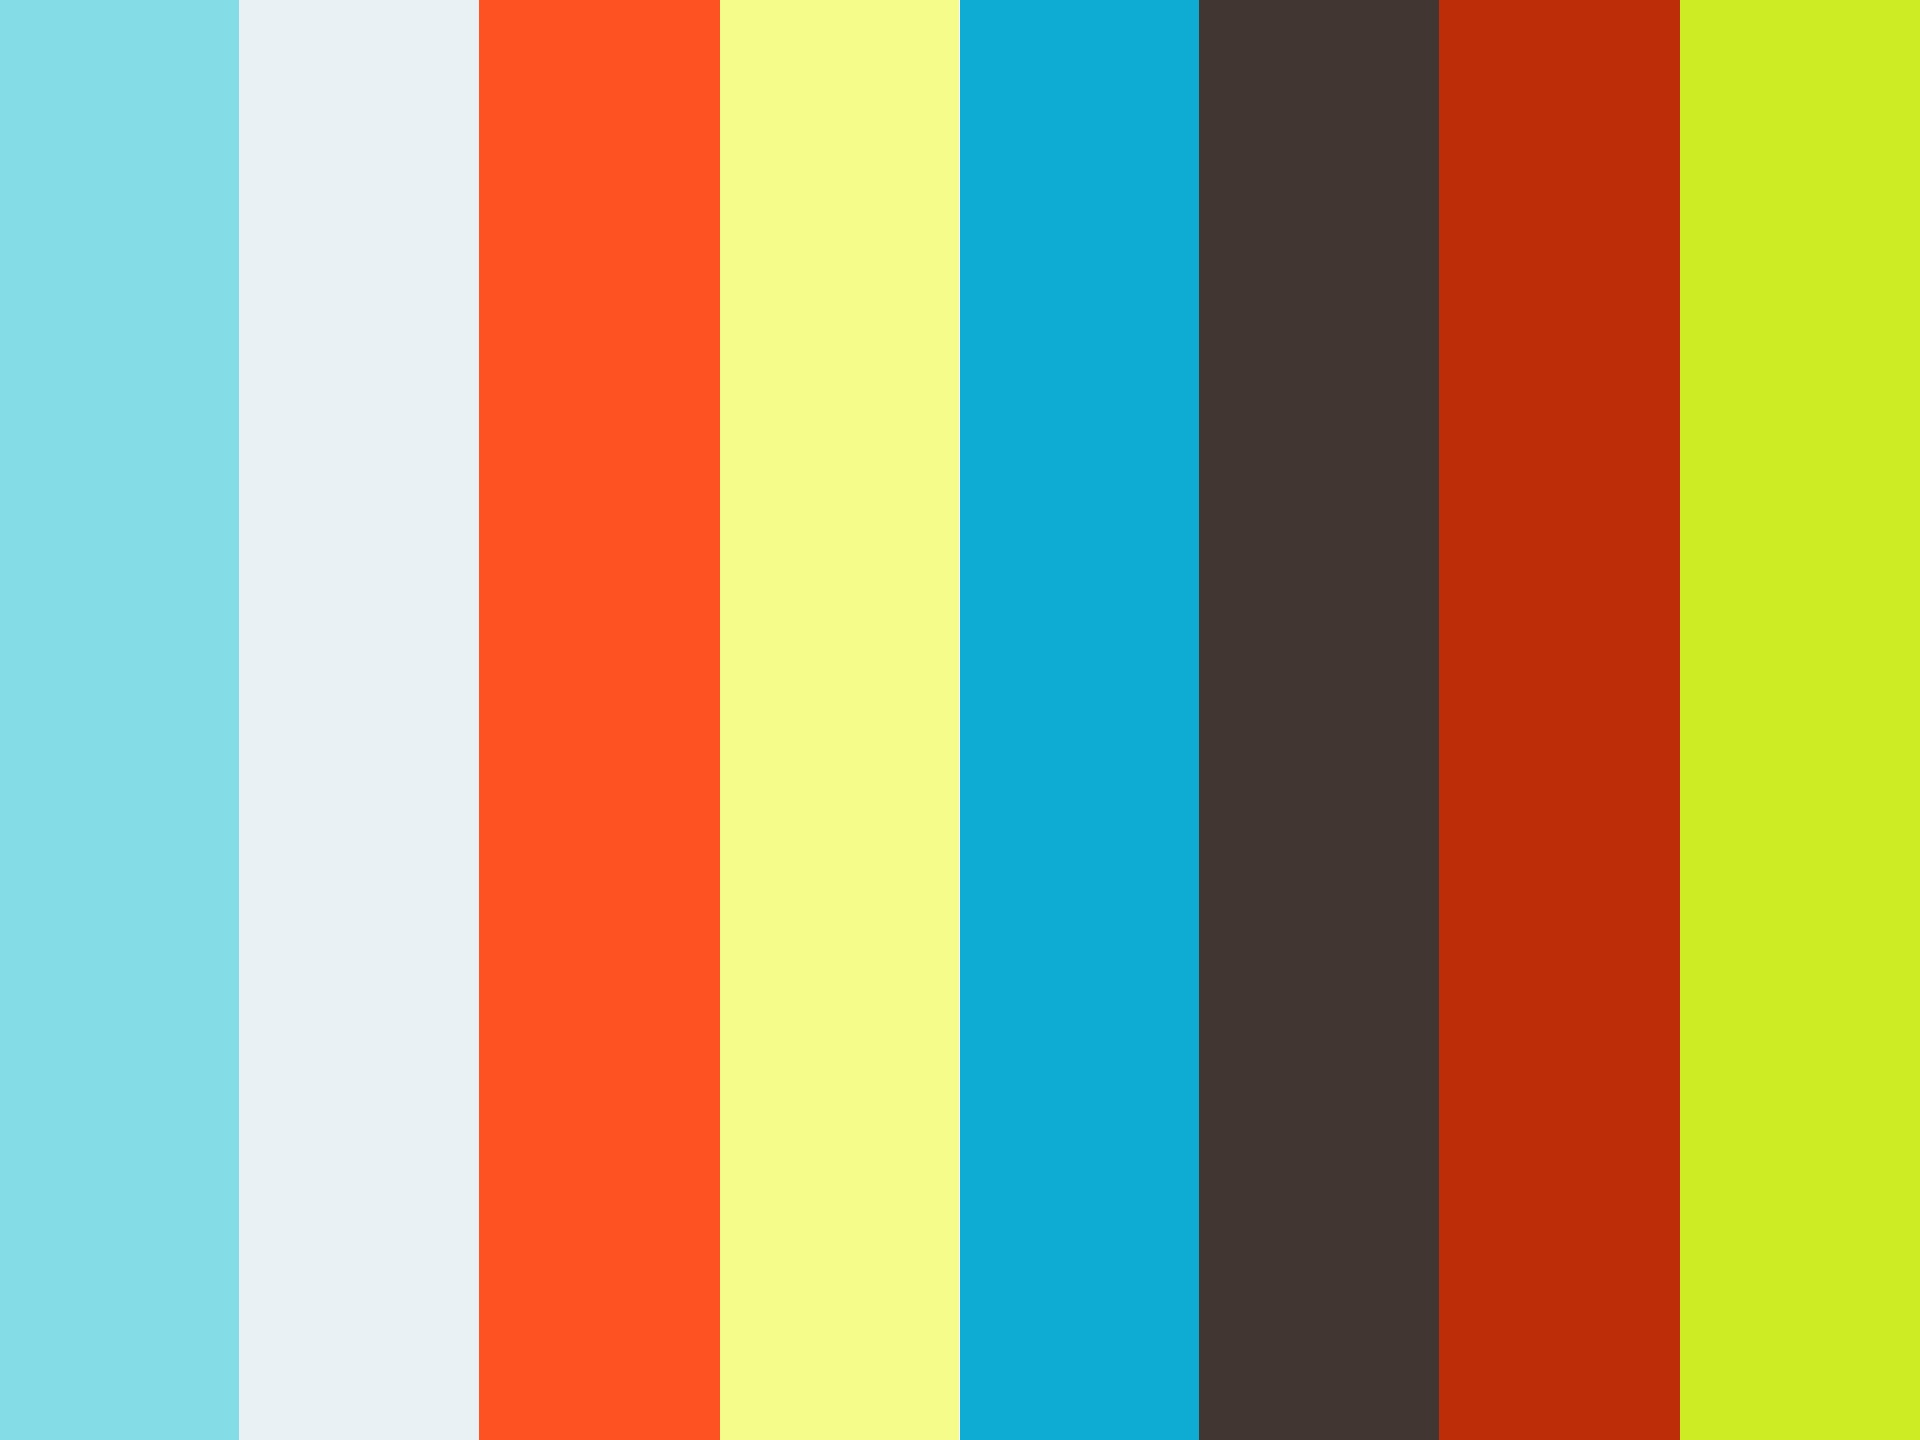 Epoxy 環氧樹脂導電地板面漆塗抹環氧樹脂工程EPOXY地板施工施工0932-518699 on Vimeo